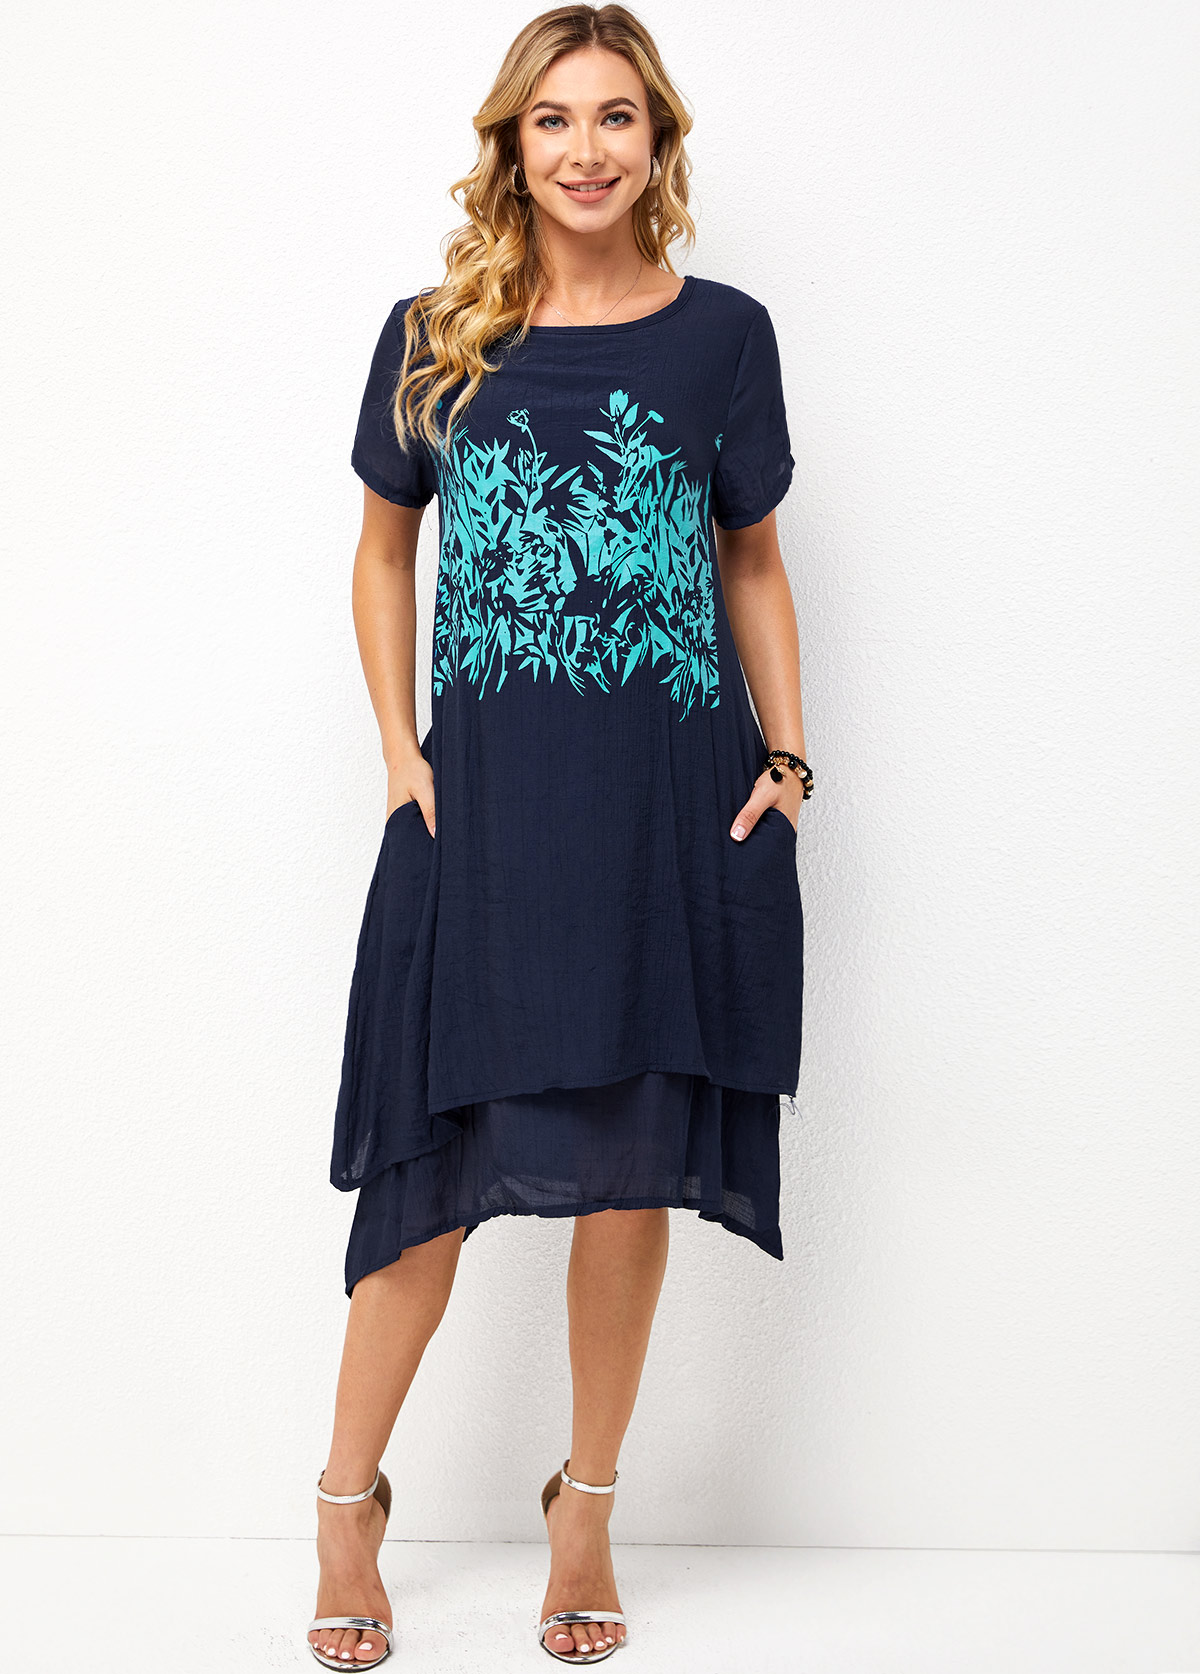 Printed Round Neck Short Sleeve Layered Dress